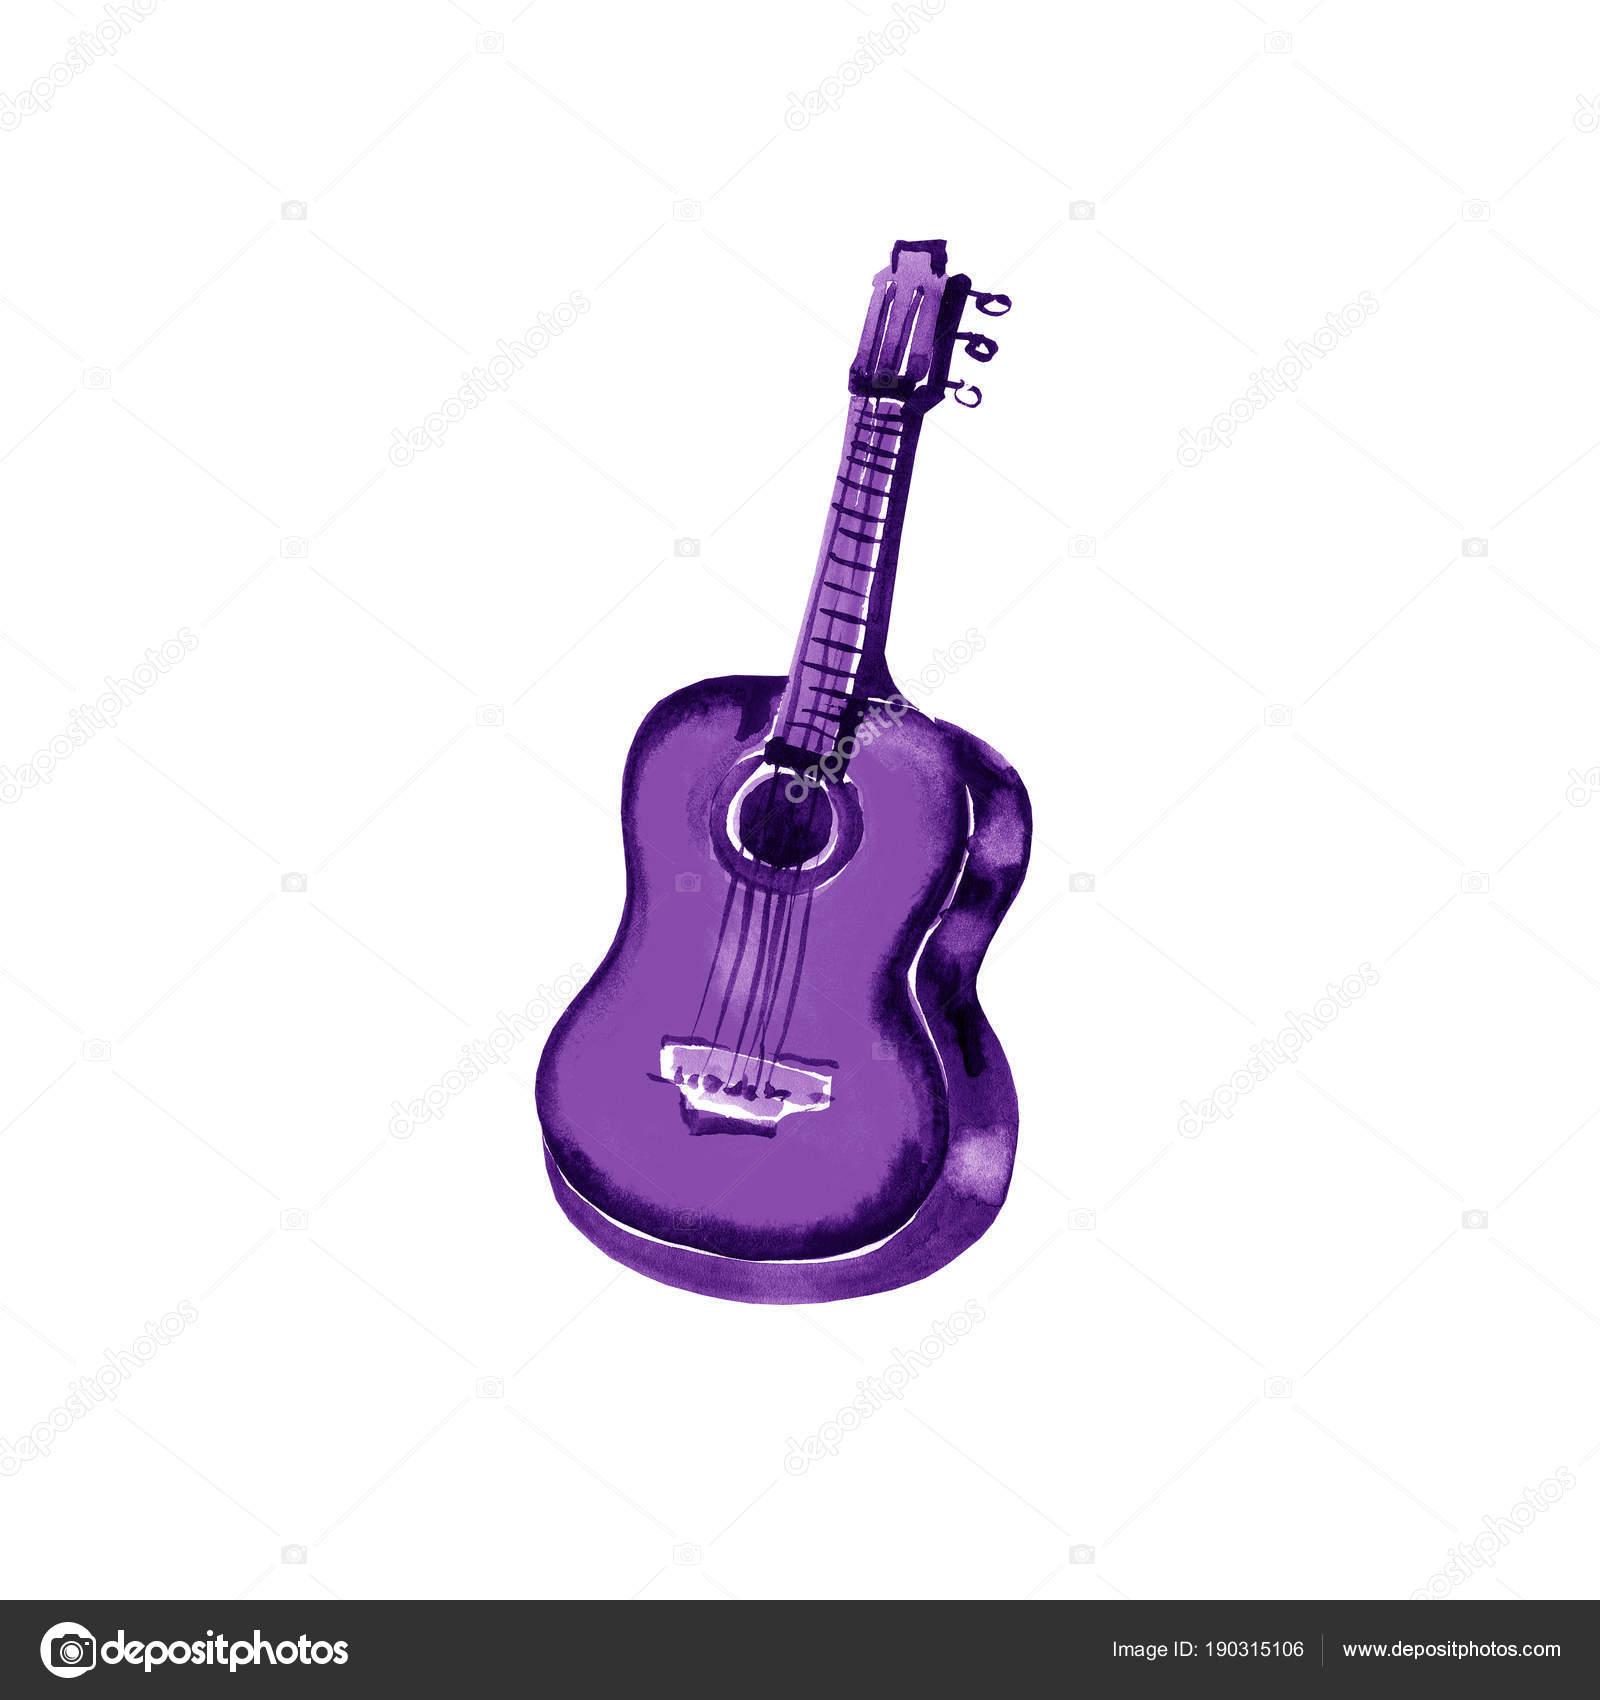 Acoustic Guitar Watercolor Illustration Violet On White Background